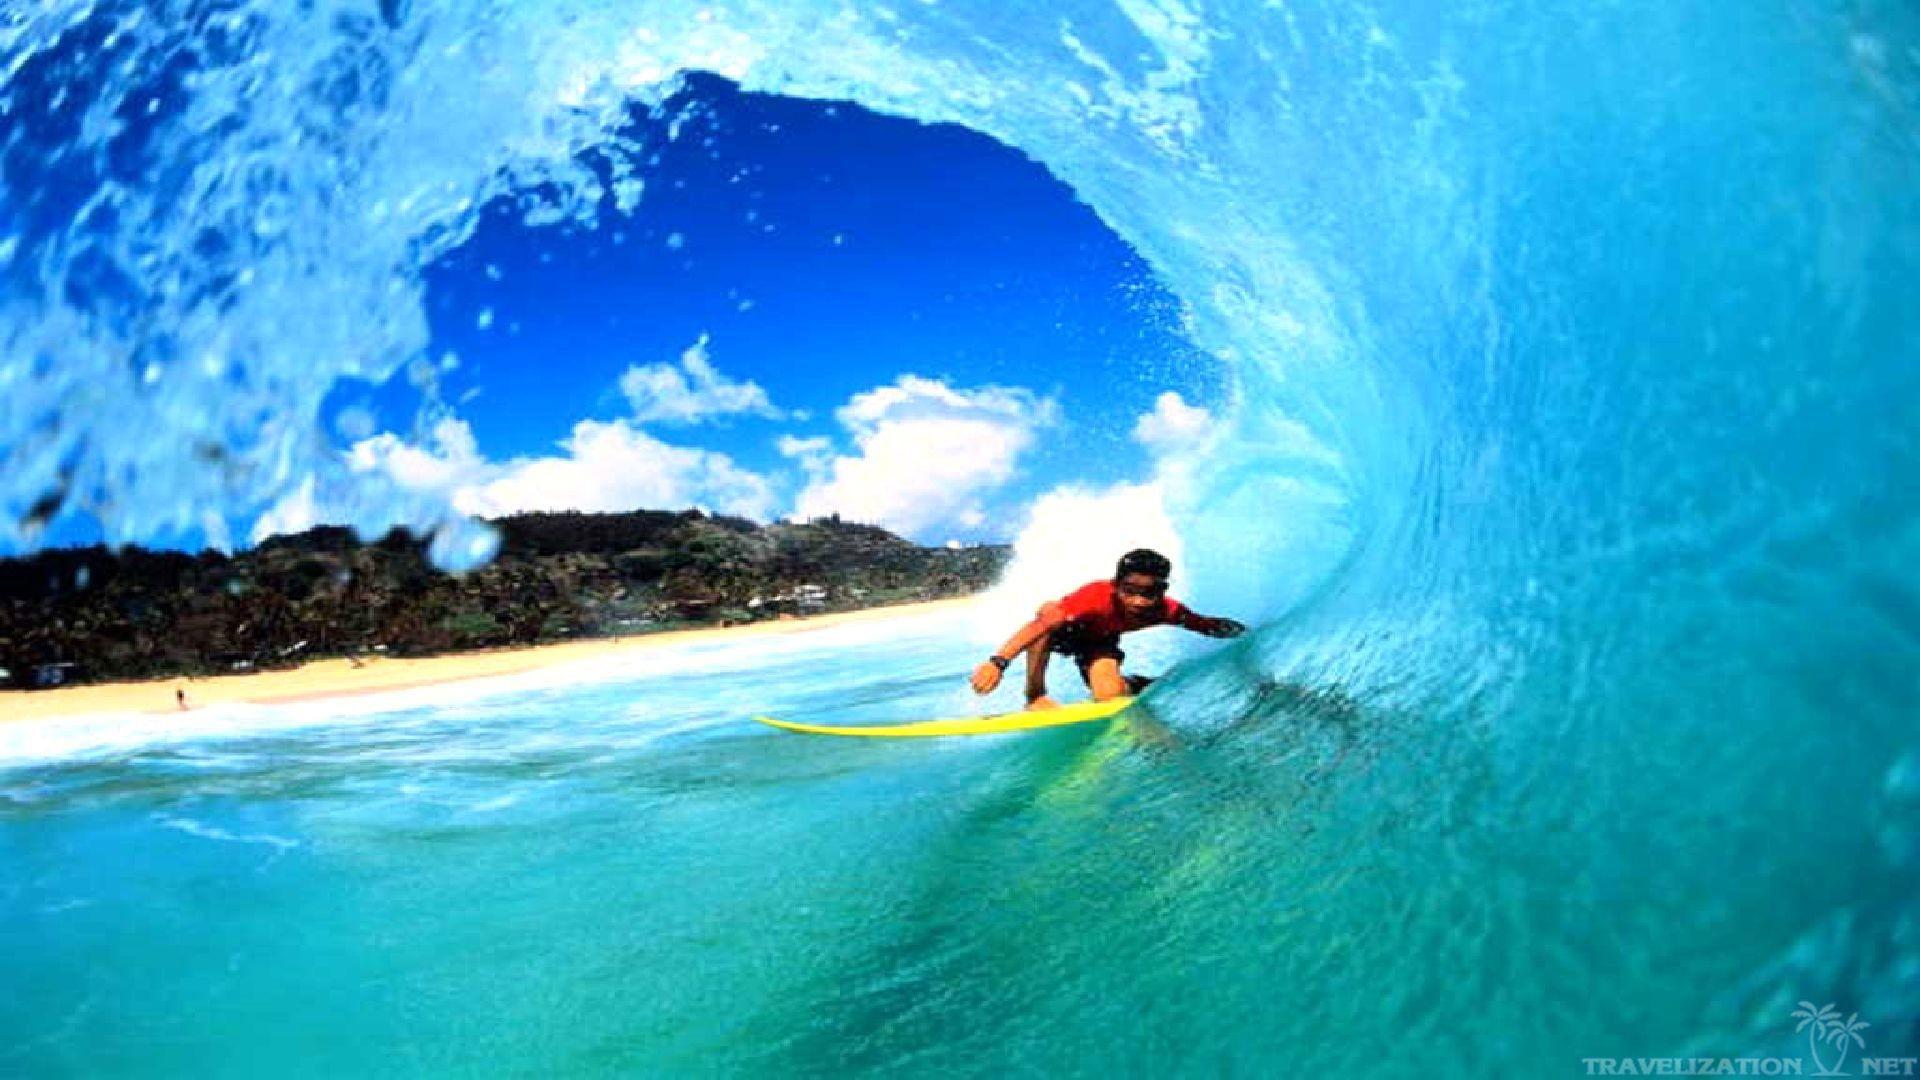 … surfing wallpapers travelization; steam wallpapers on kubipet com …